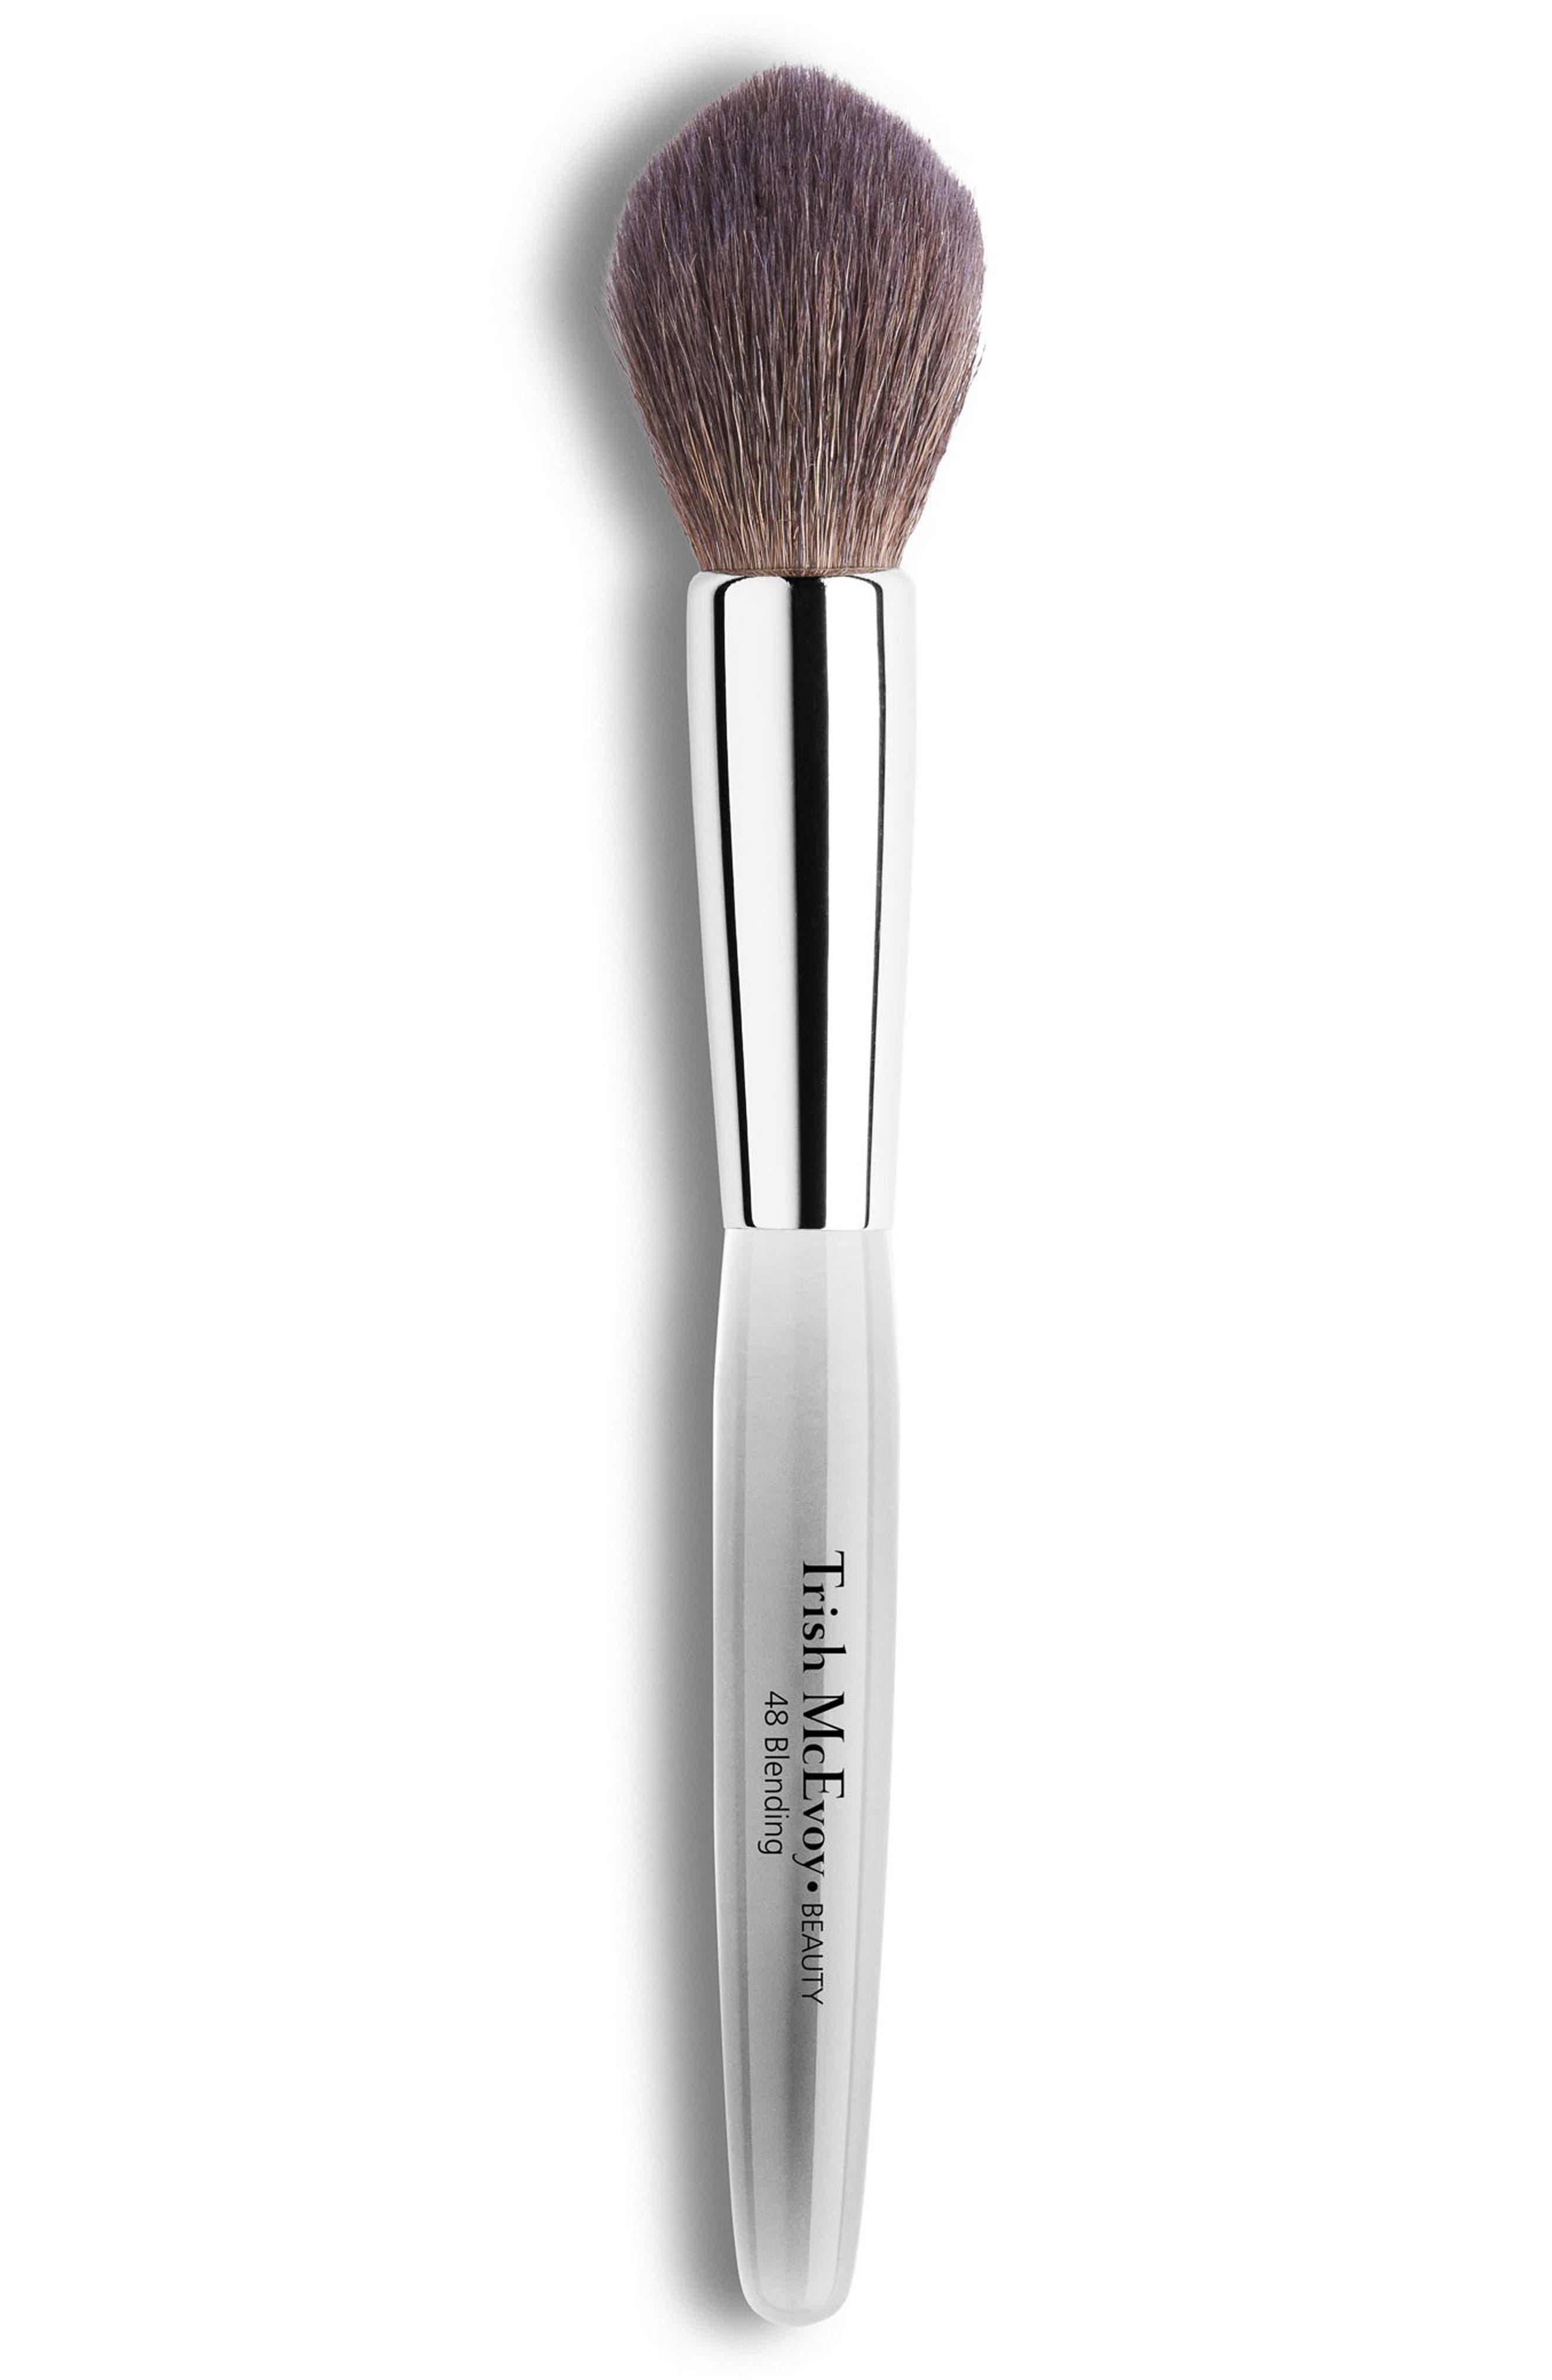 Main Image - Trish McEvoy #48 Blending Brush